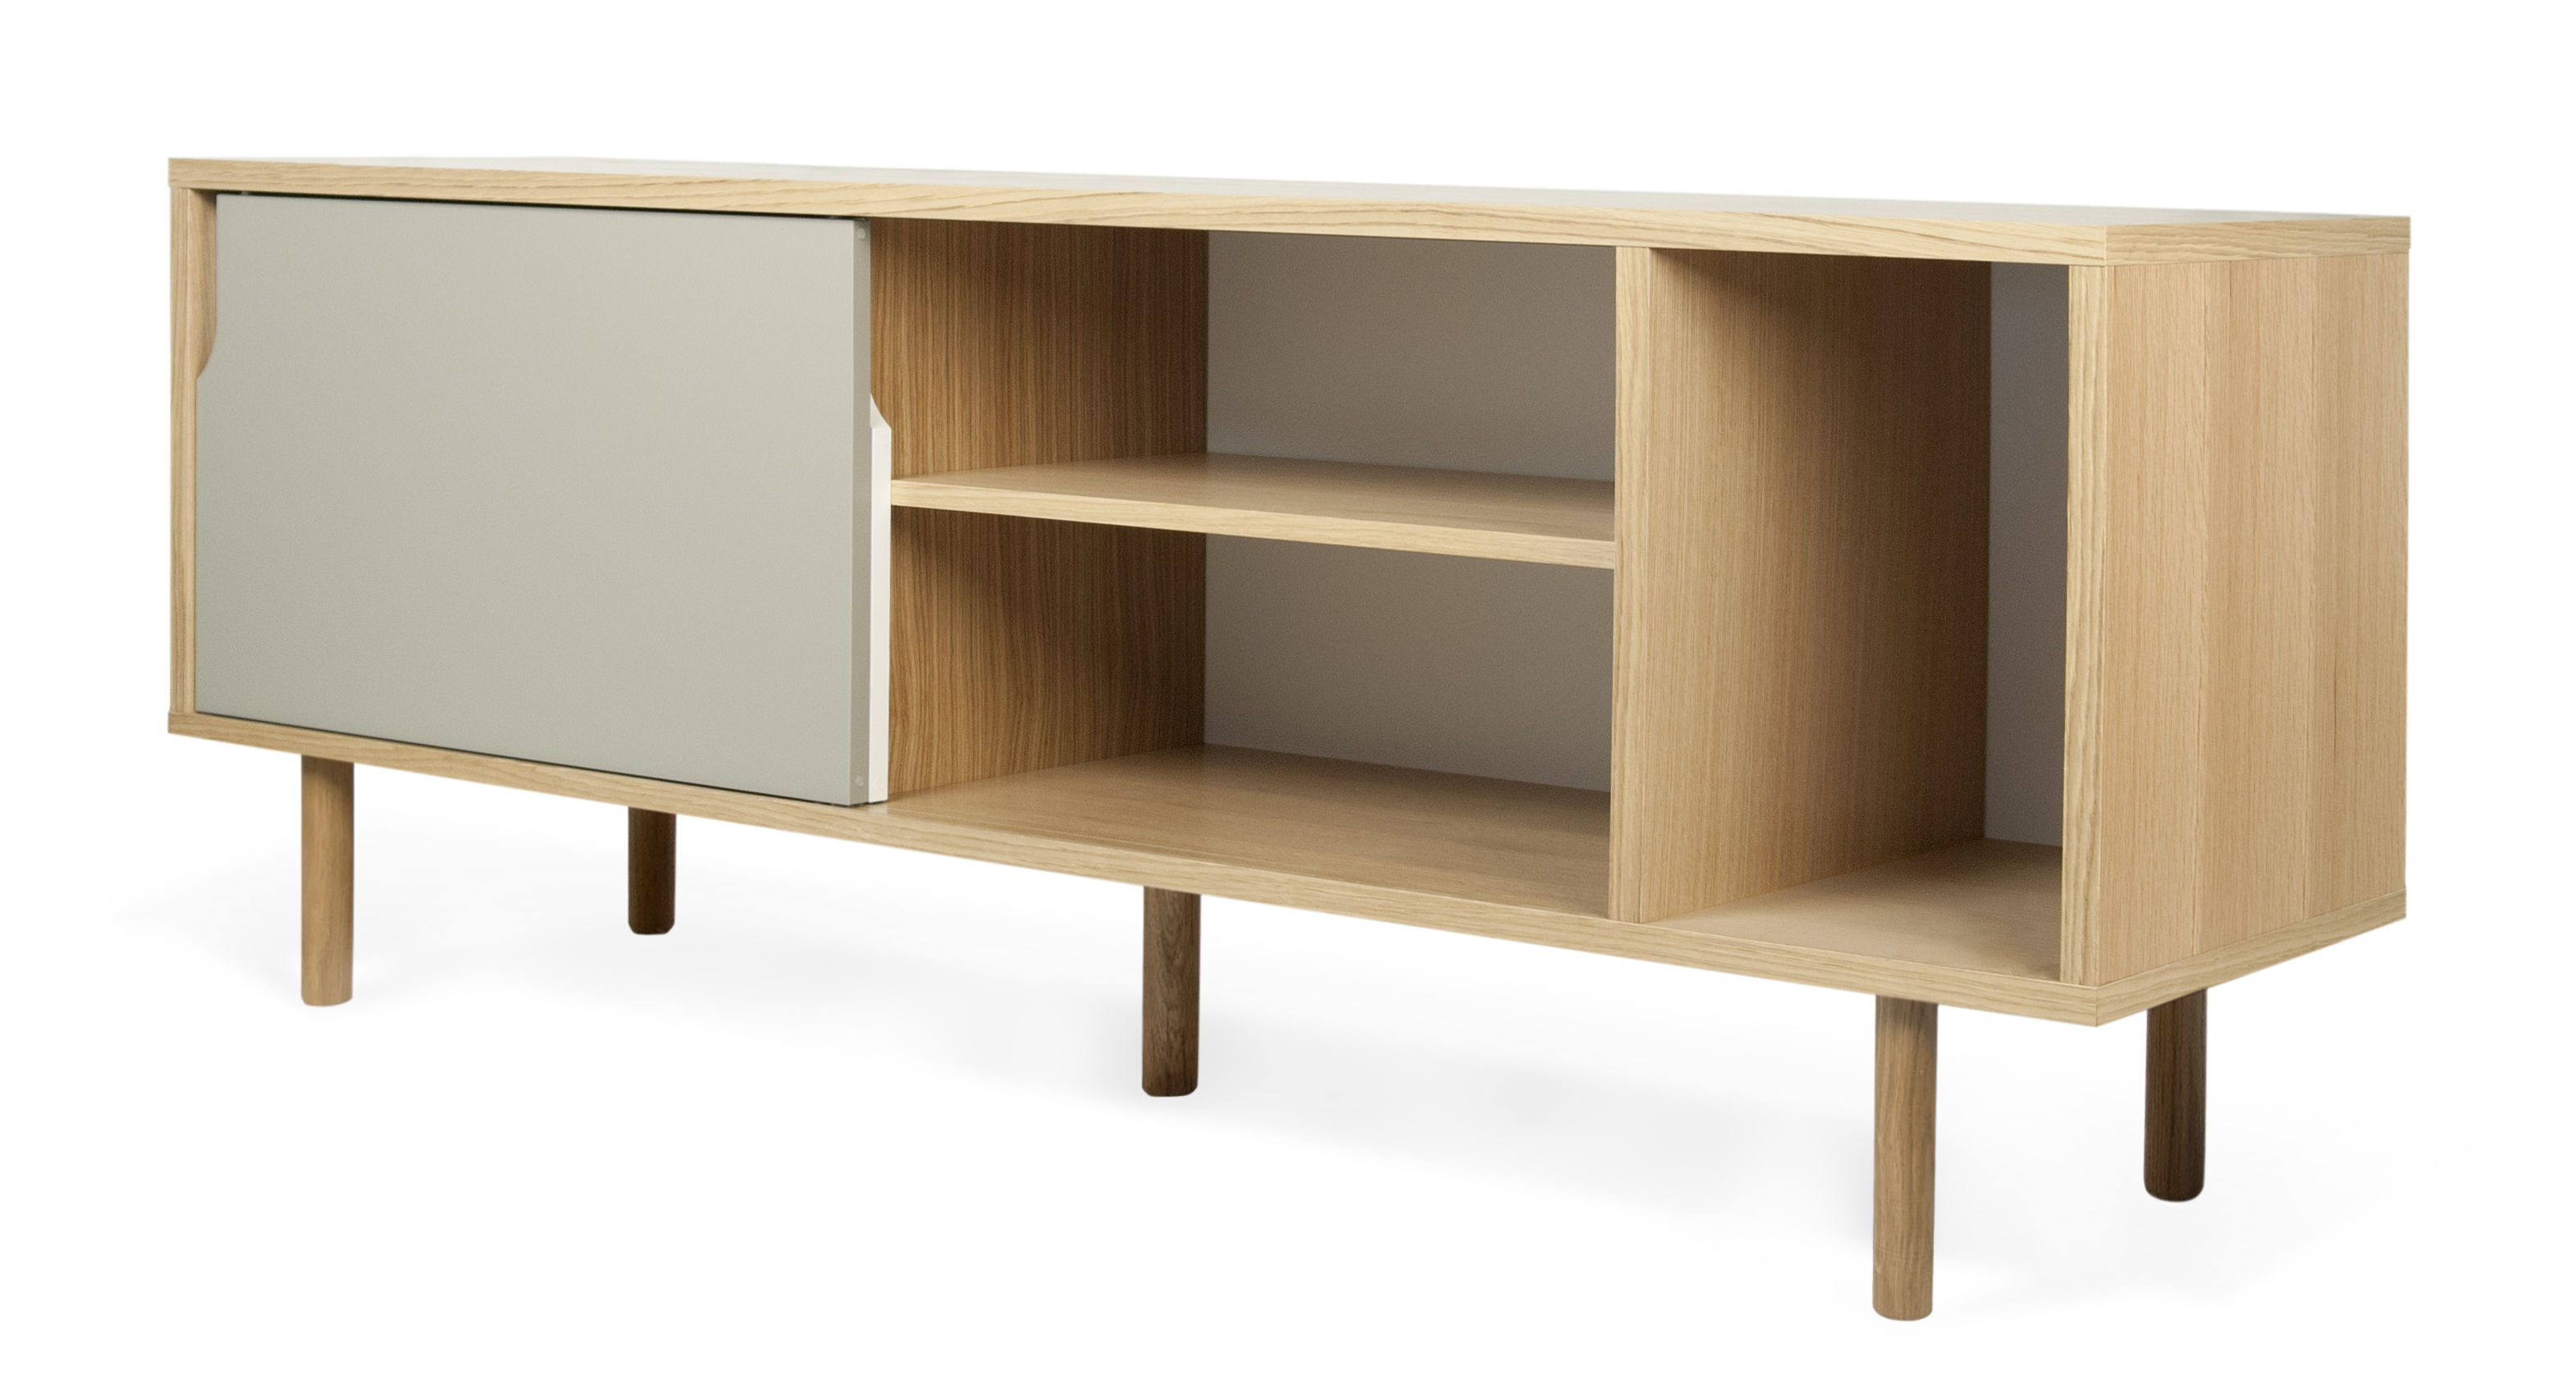 buffet amsterdam l 165 cm ch ne portes blanche grise pop up home. Black Bedroom Furniture Sets. Home Design Ideas